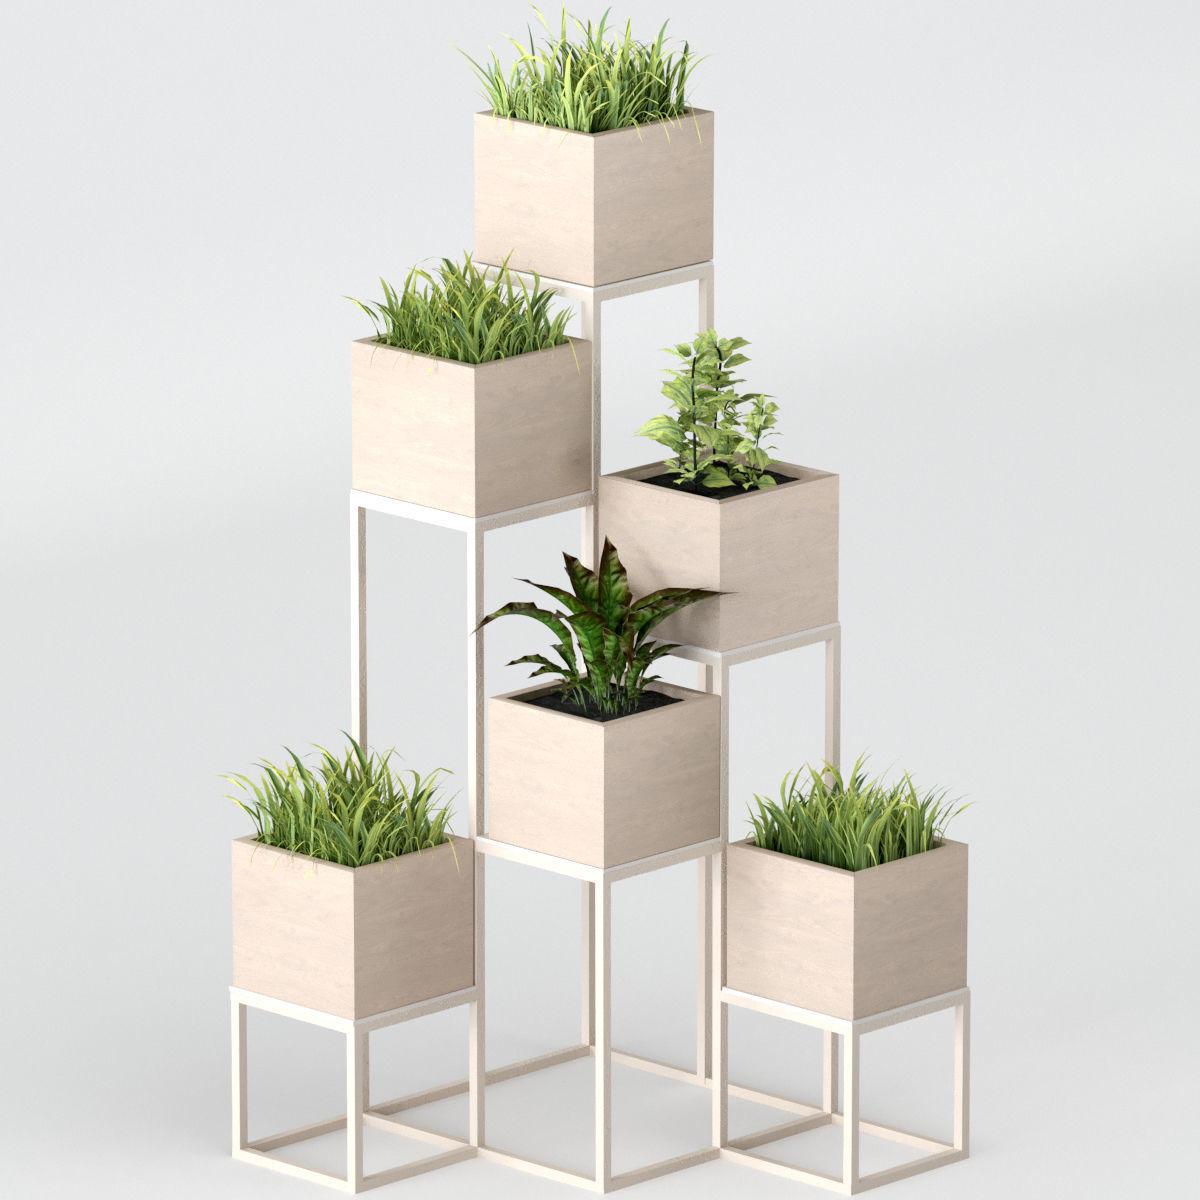 Pot Plant 3d Model Indoor Plants Shelf With Plants